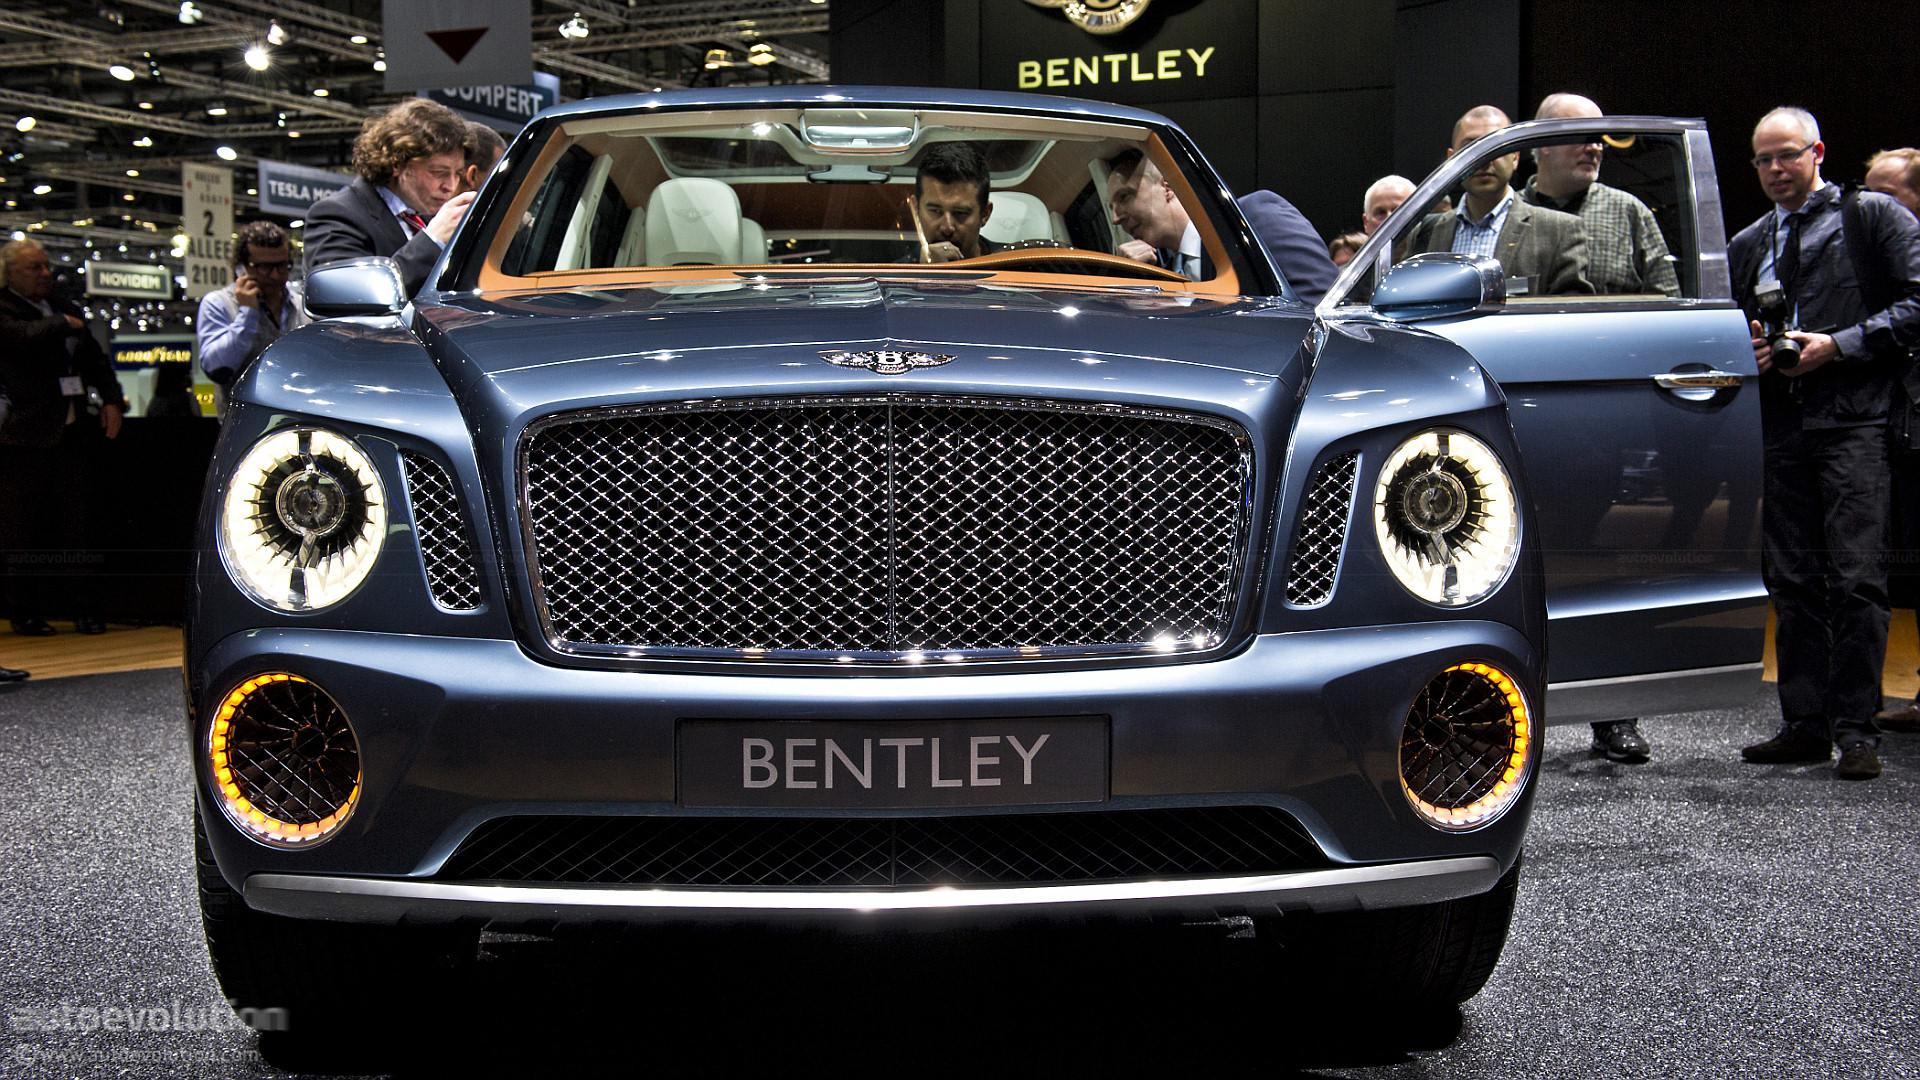 Bentley Car Logo Wallpapers Bentley Suv Gets Production Green Light Autoevolution